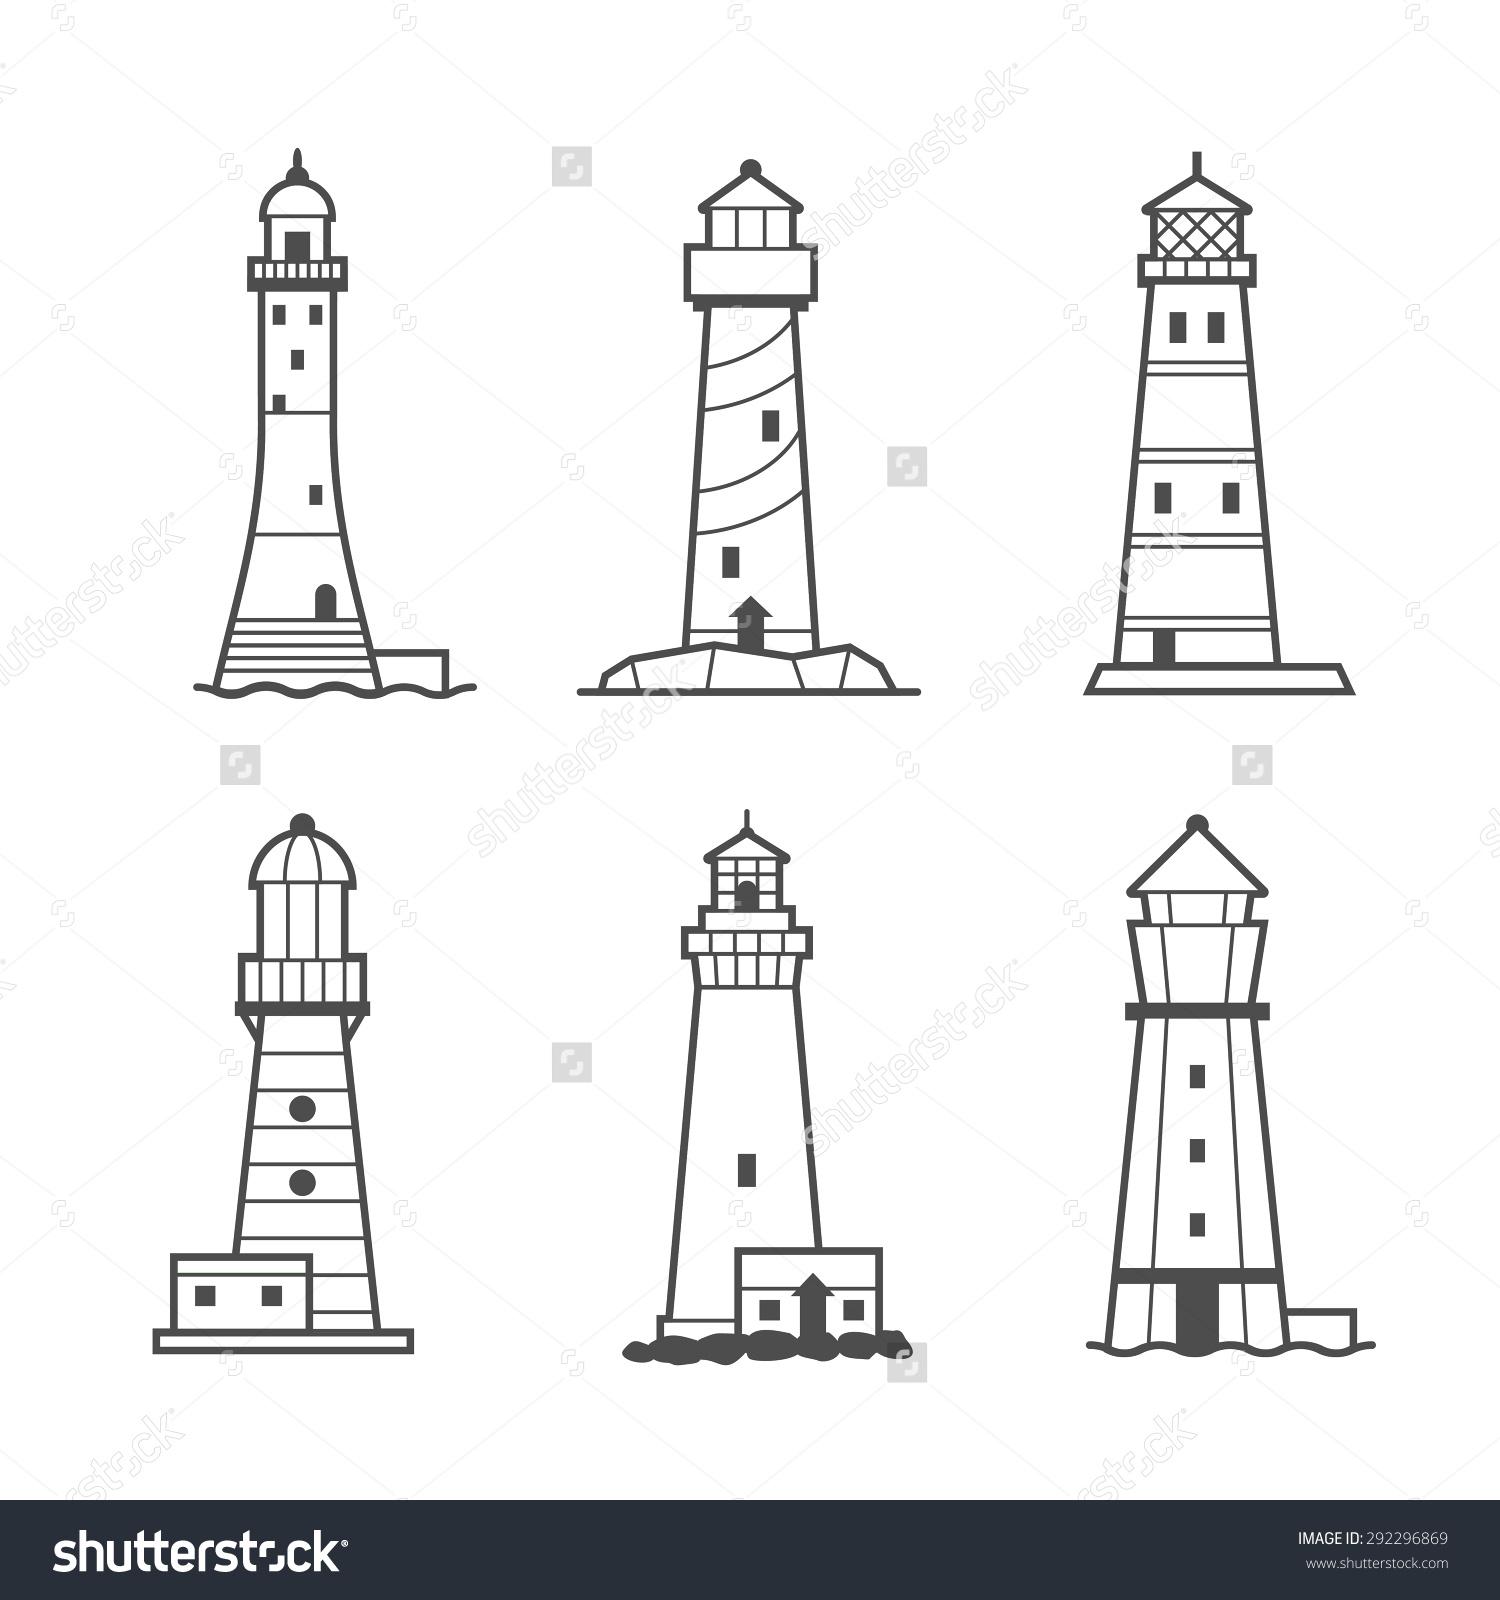 Drawn lighhouse outline Images Lighthouse Lighthouse Hand Lighthouse